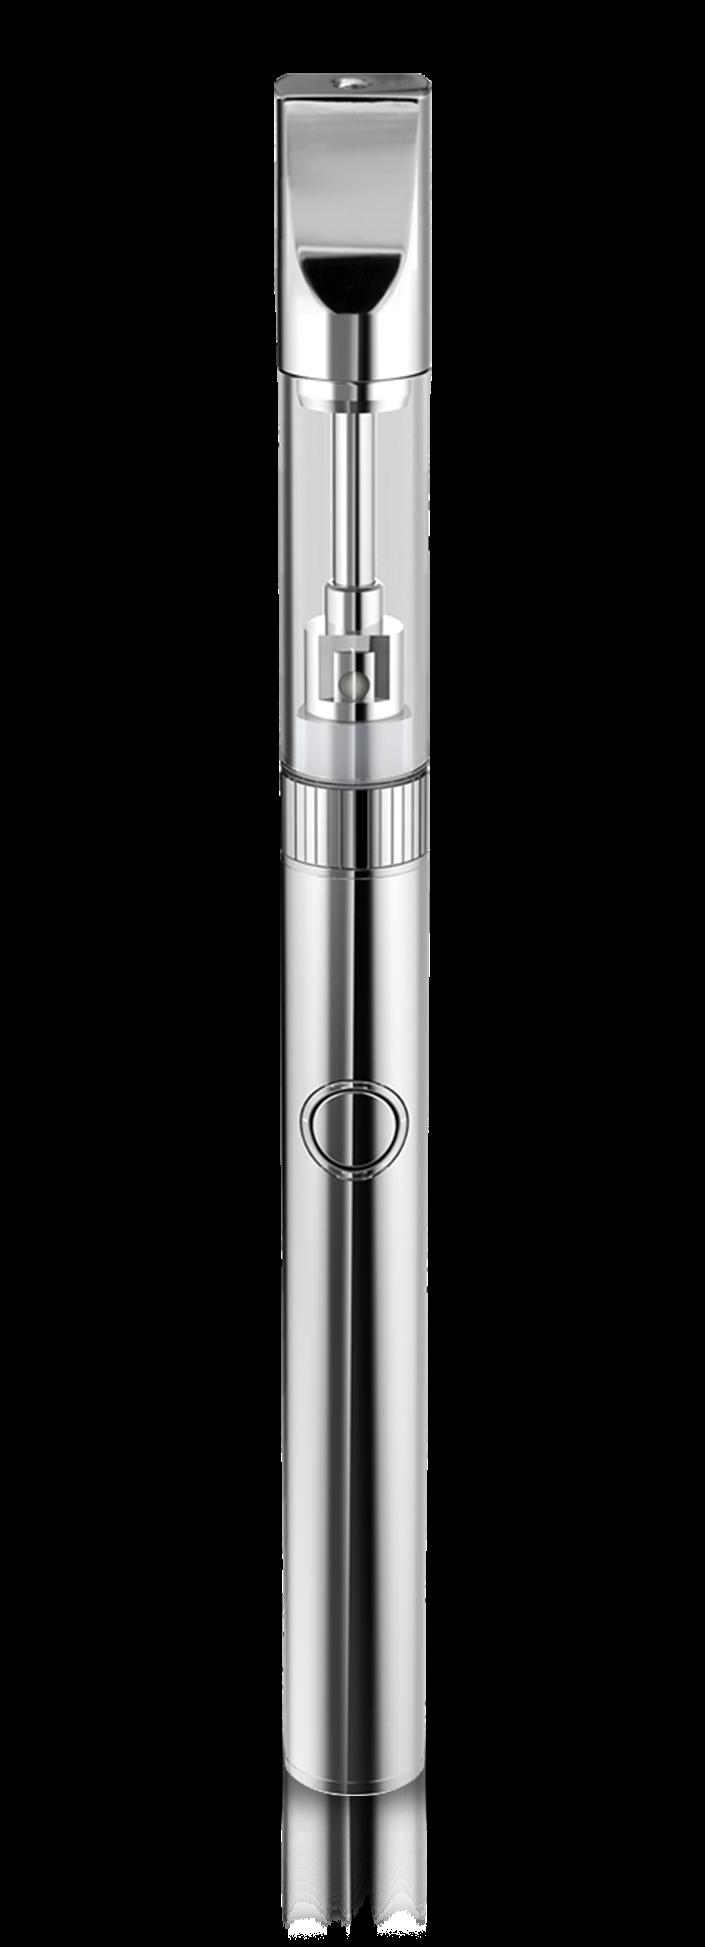 eos vape pen